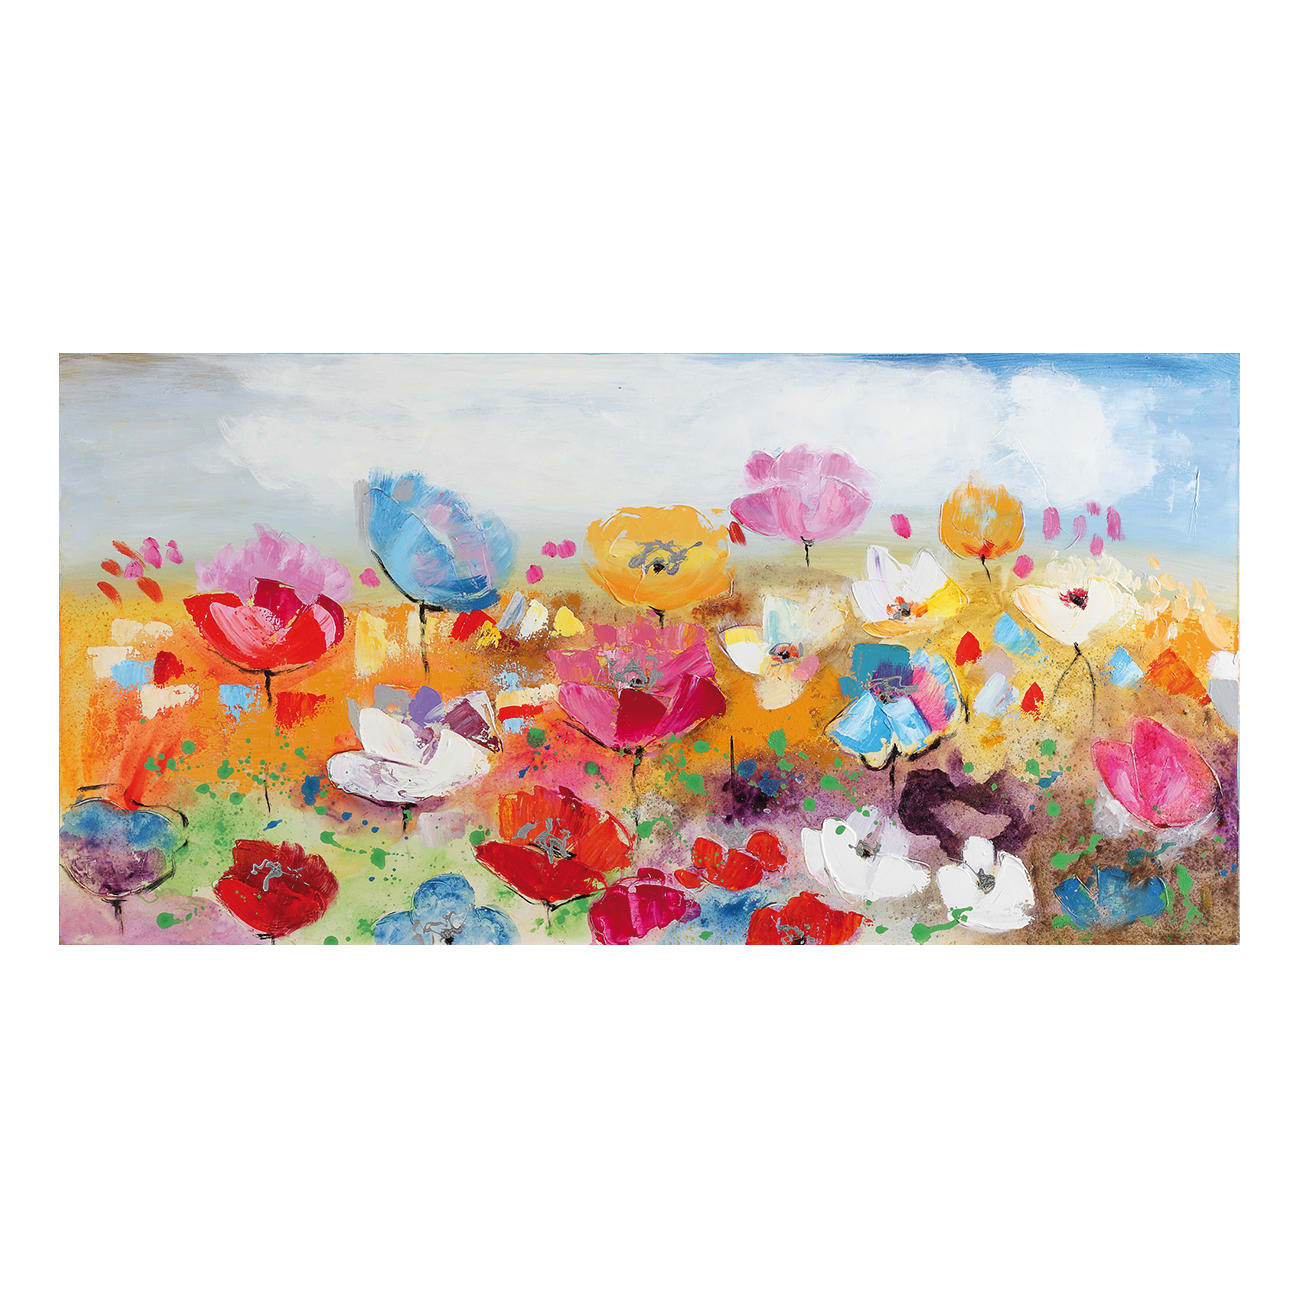 Quadri Cucina Leroy Merlin quadro dipinto a mano fiori misti 120x60 cm